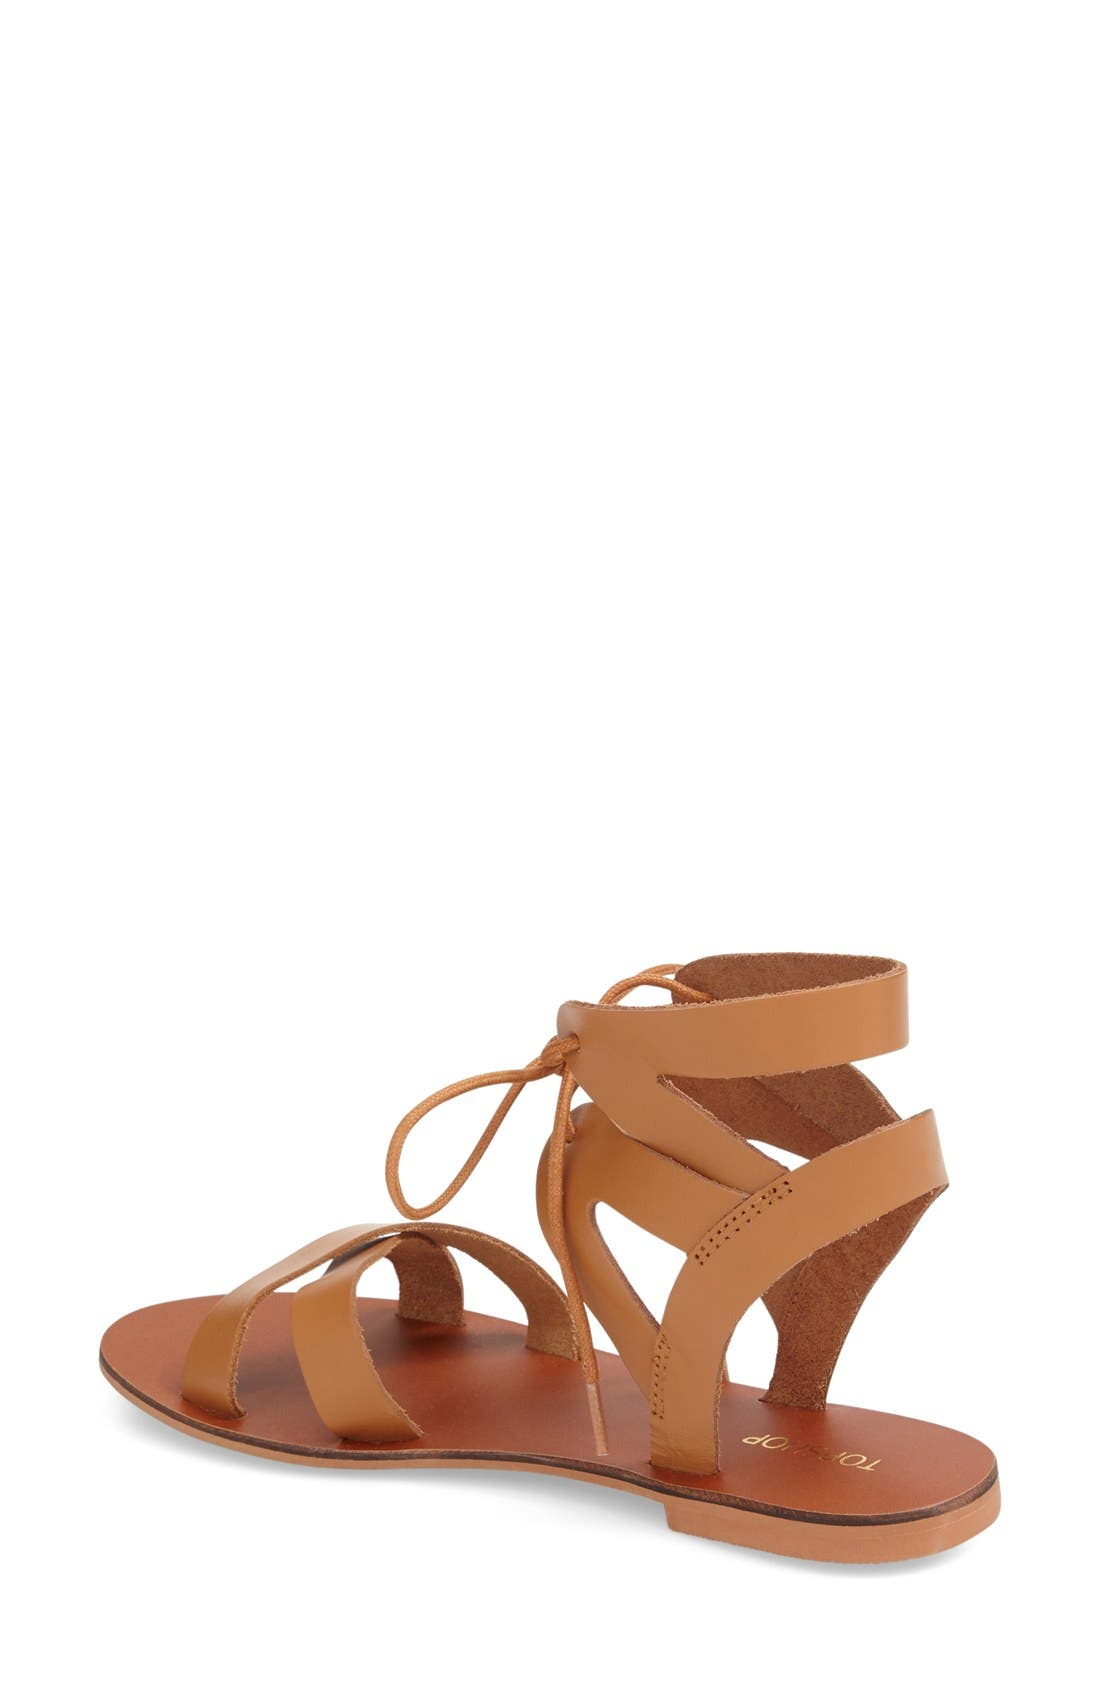 TOPSHOP, 'Herb' Lace-Up Flat Sandal, Alternate thumbnail 3, color, 210